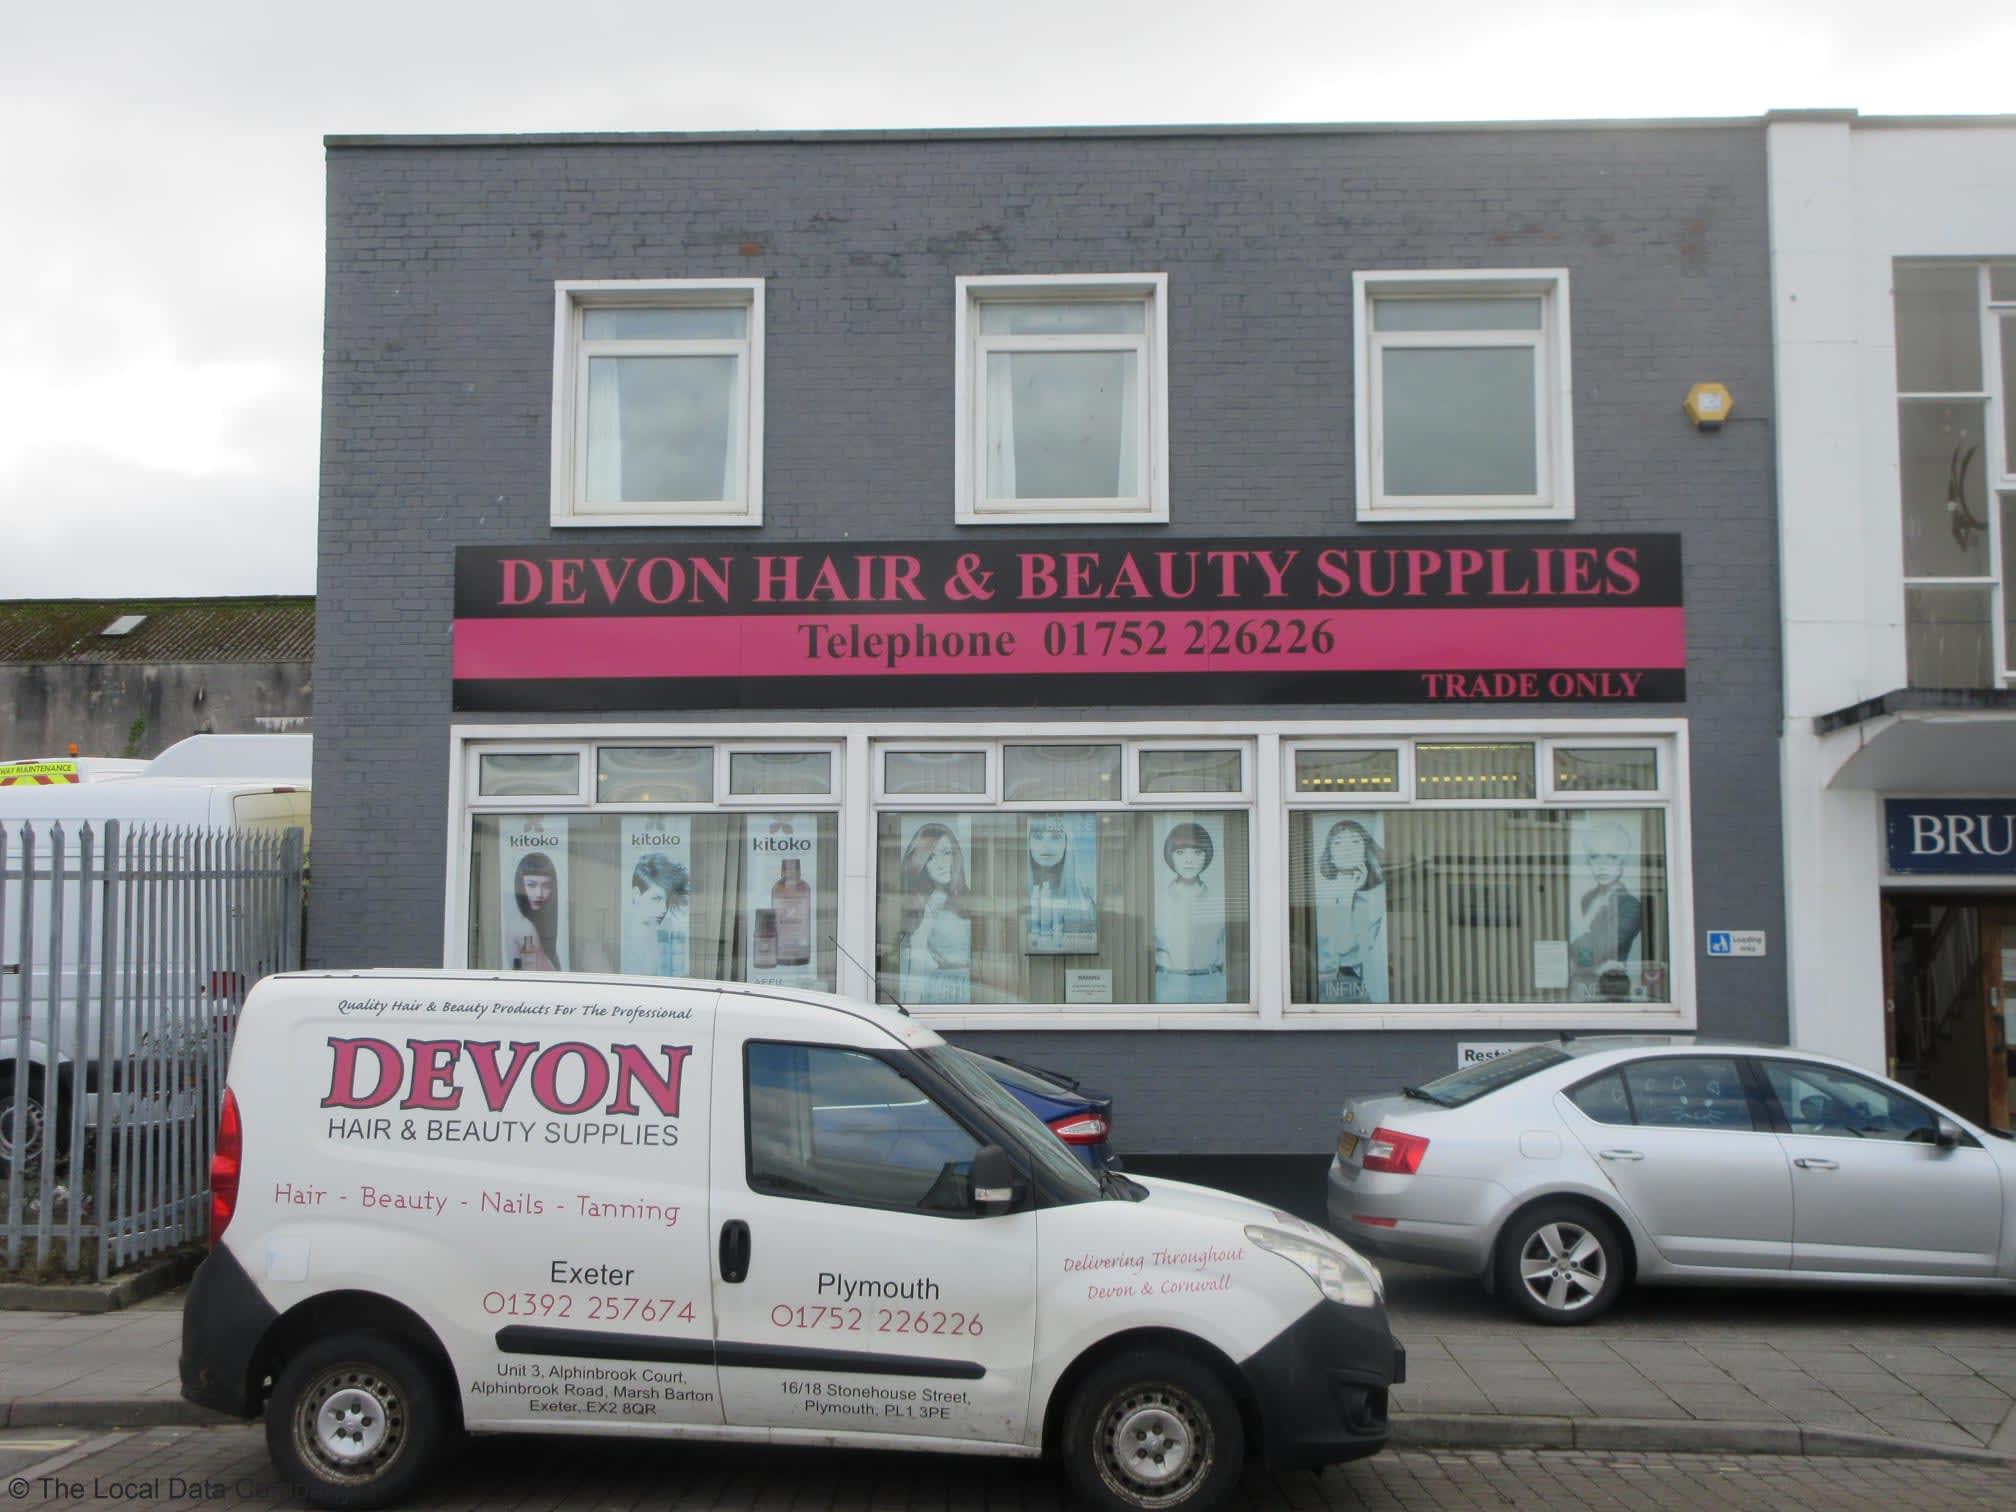 Devon Hair & Beauty Supplies